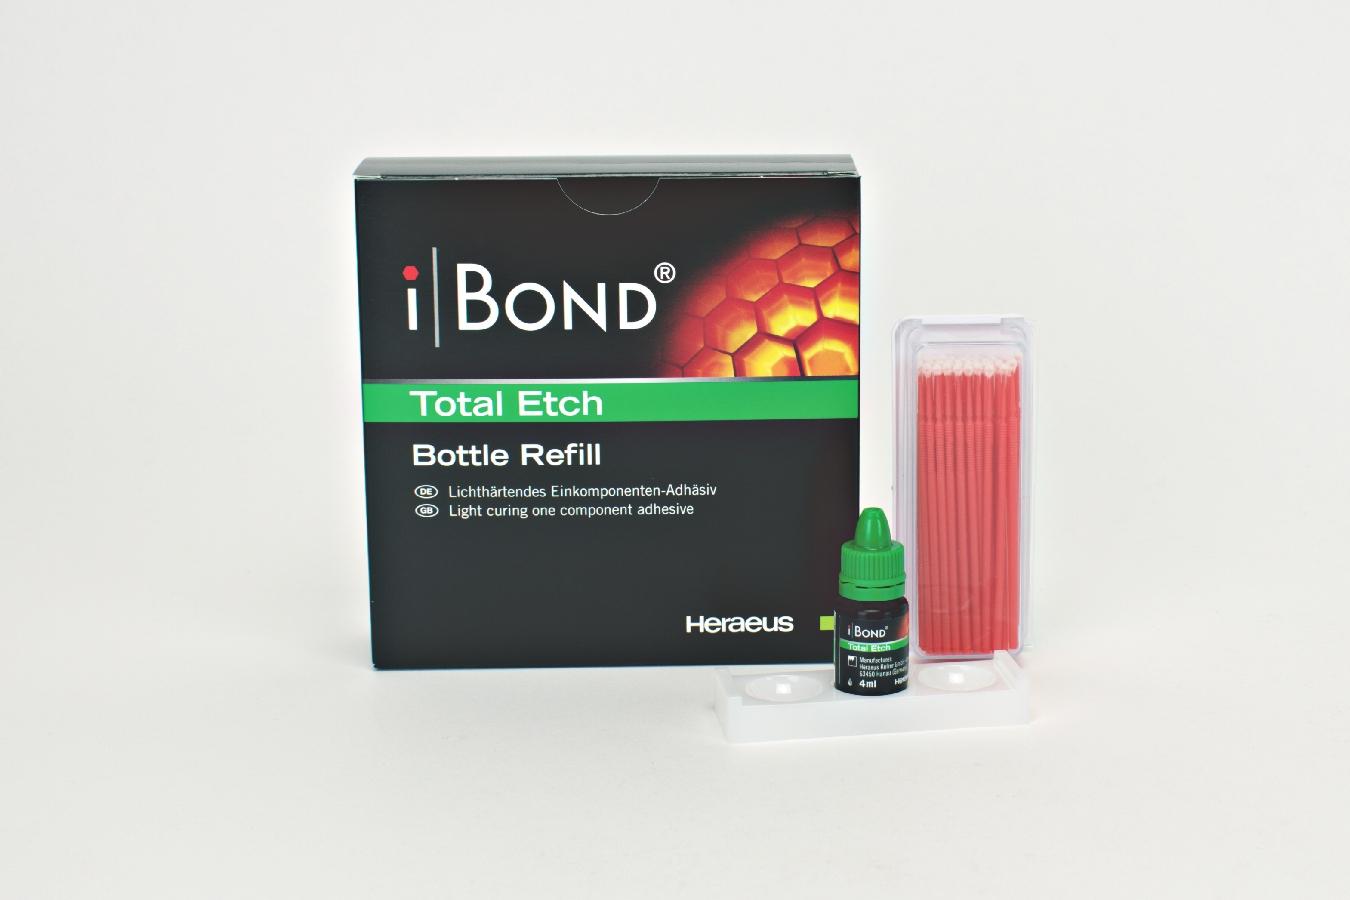 iBOND Total Etch Bottle Refill Pa